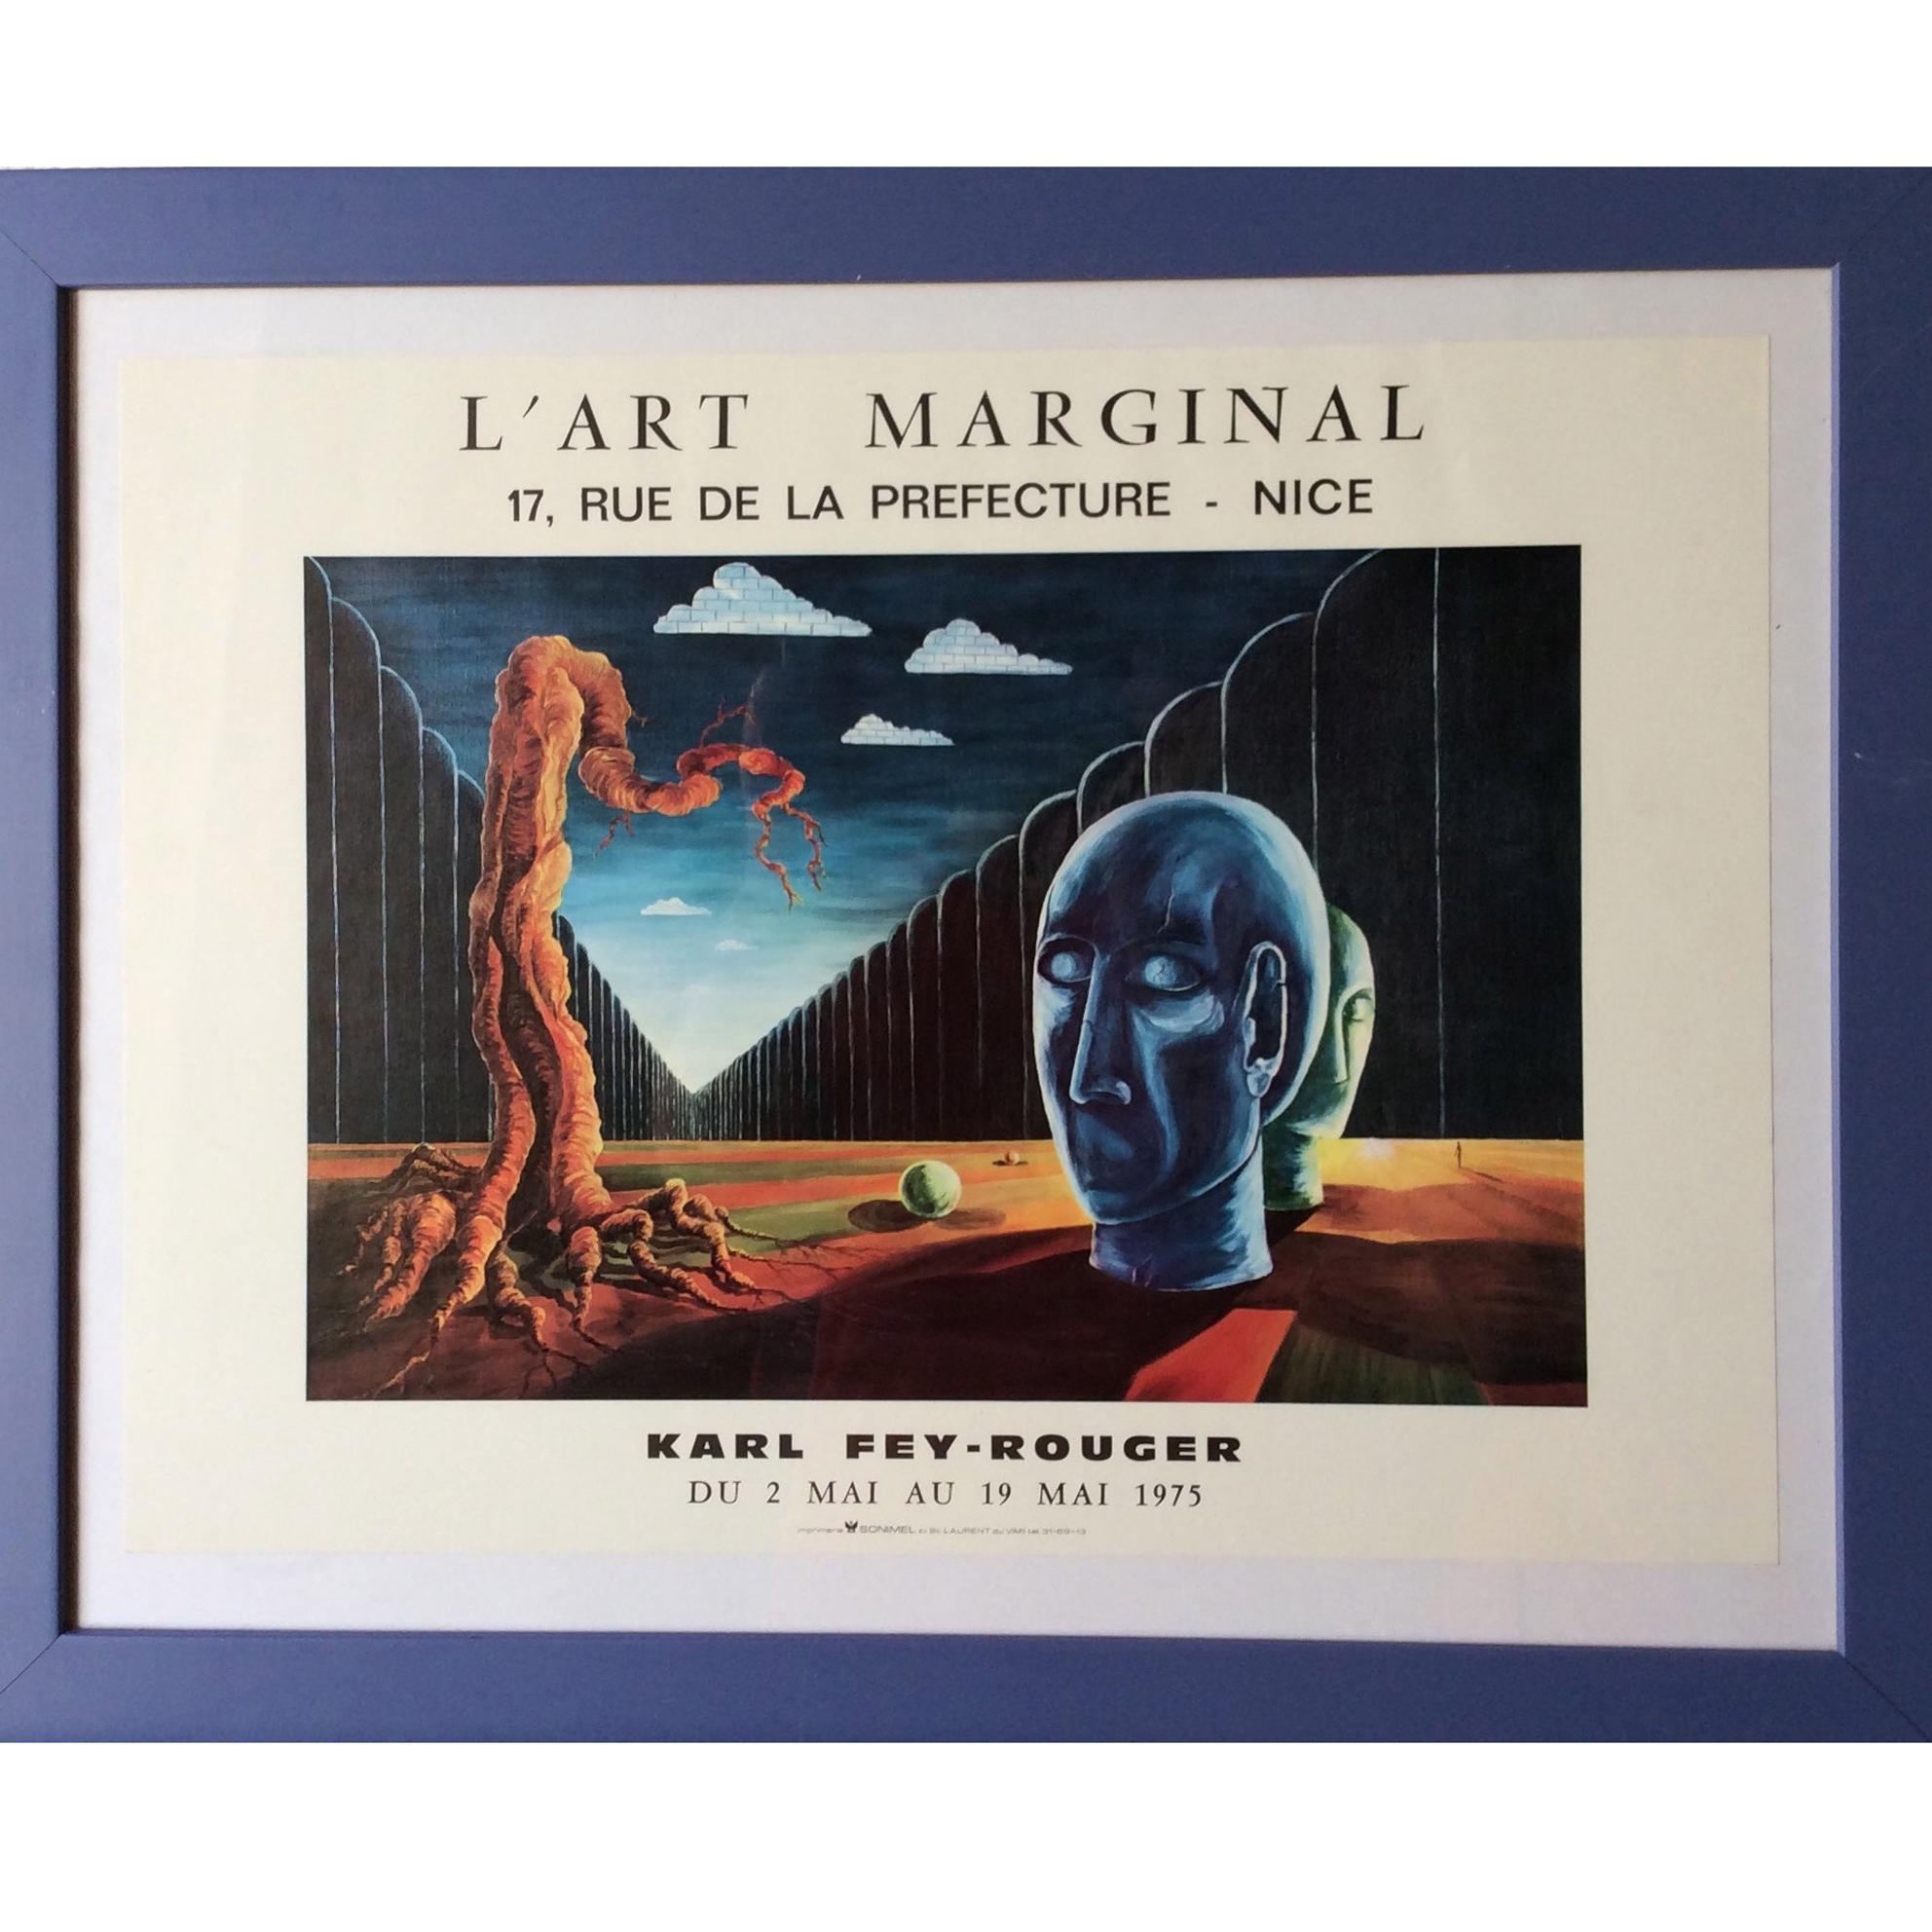 Midcentury Framed Surrealist Art Exhibition Poster, circa 1975